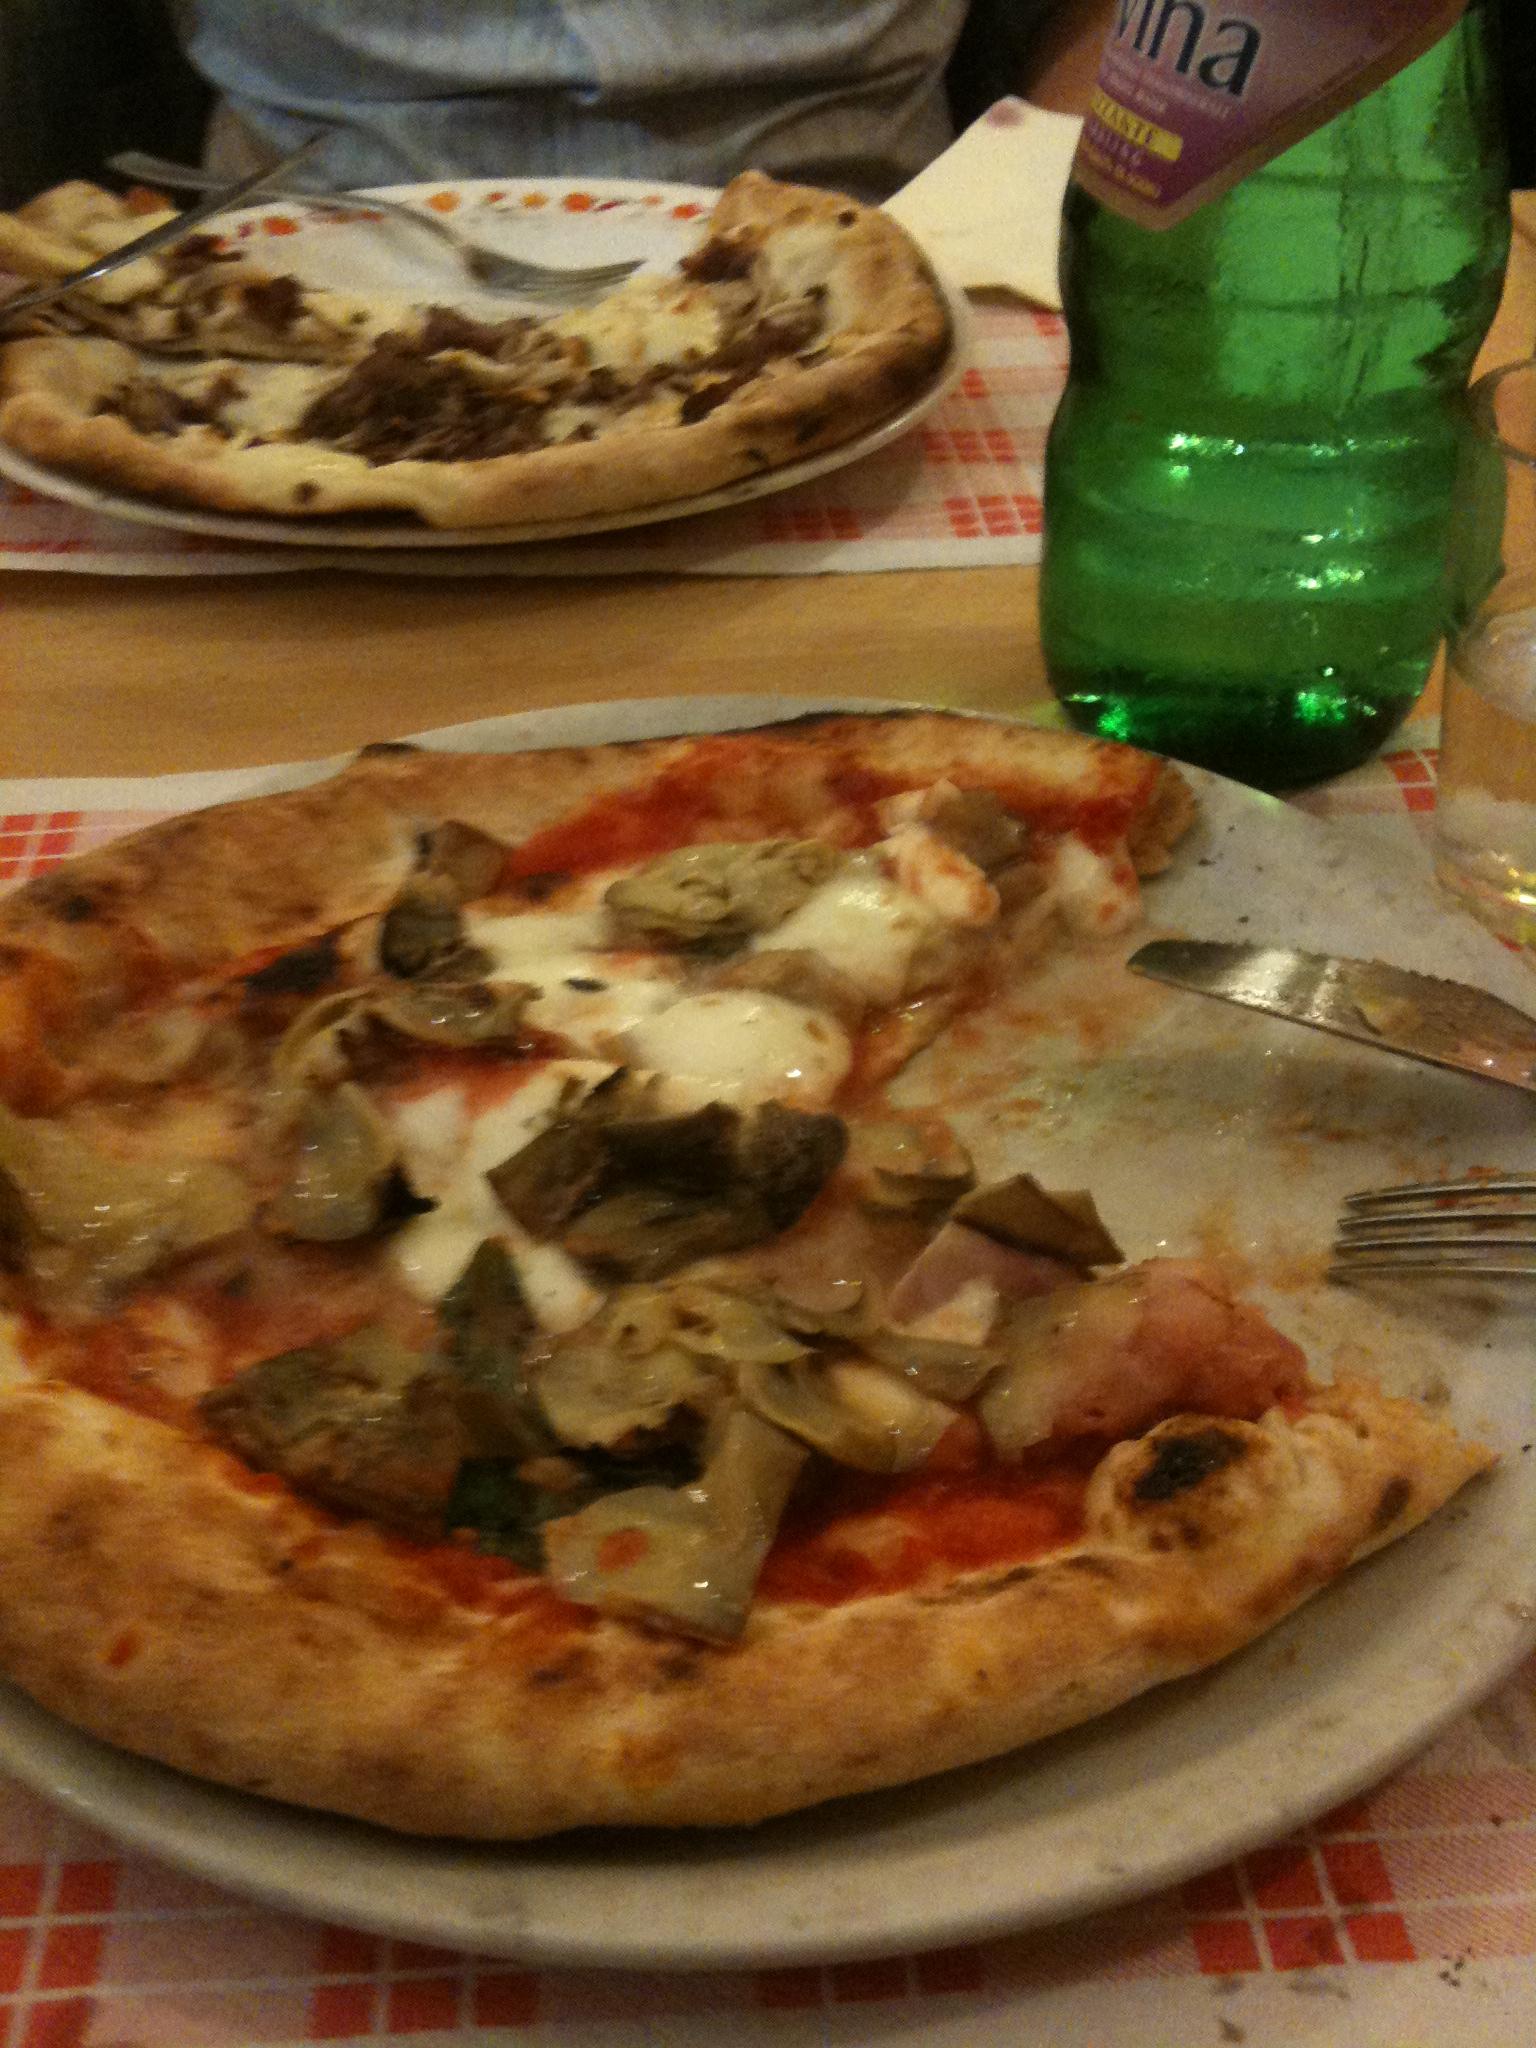 mmmm pizza